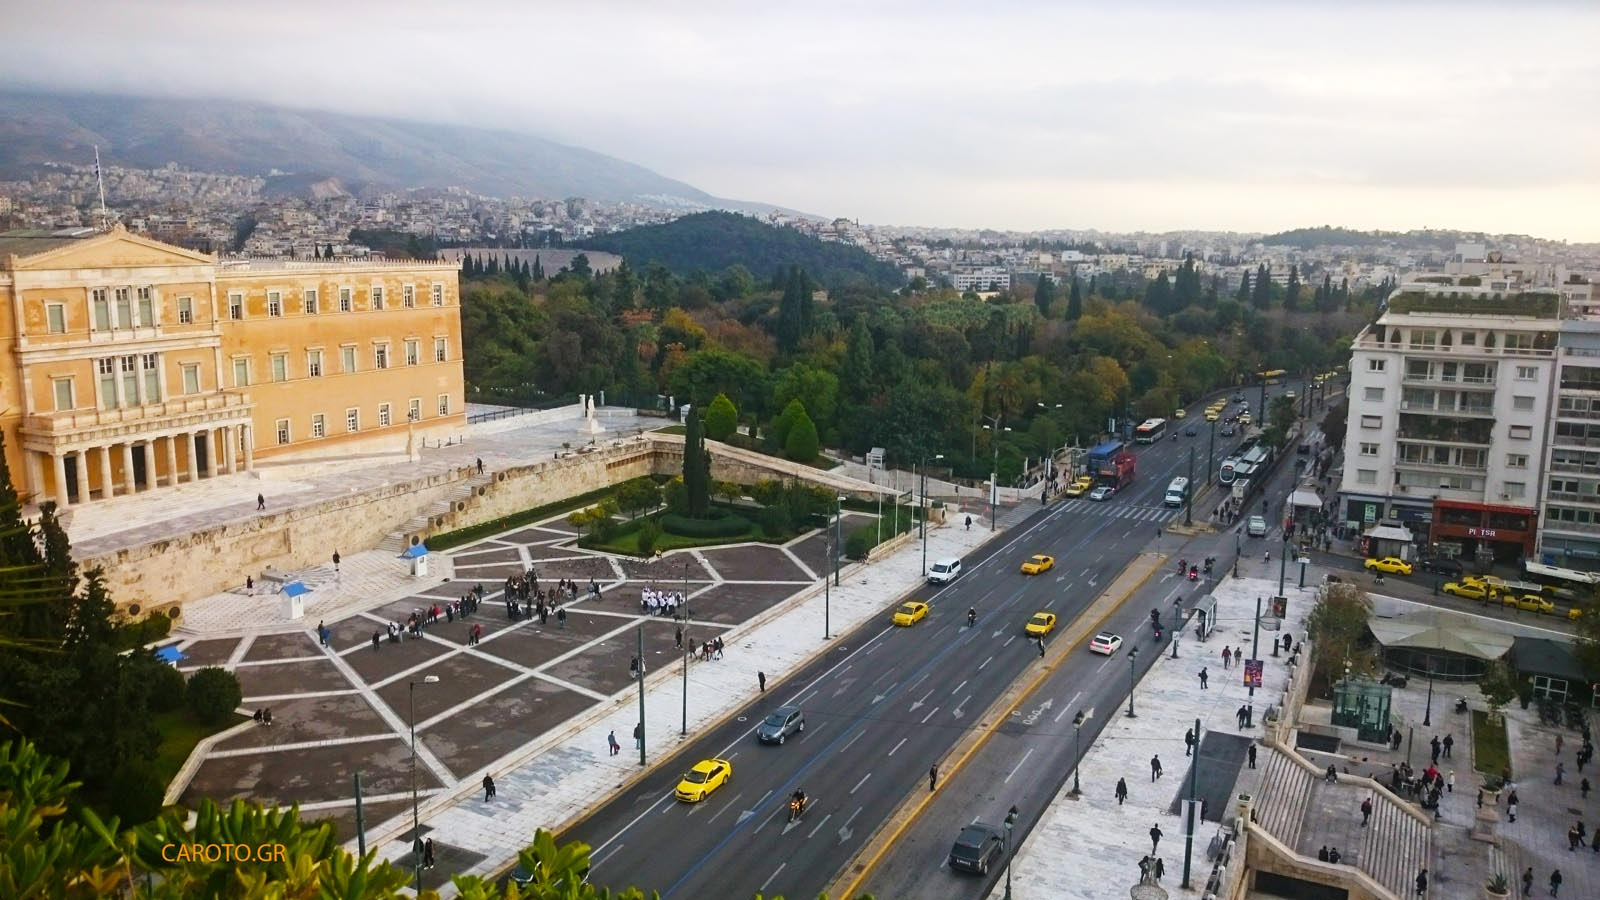 Photo of Ο κορωνοϊός «καθαρίζει» την ατμόσφαιρα στον πλανήτη και στην Ελλάδα